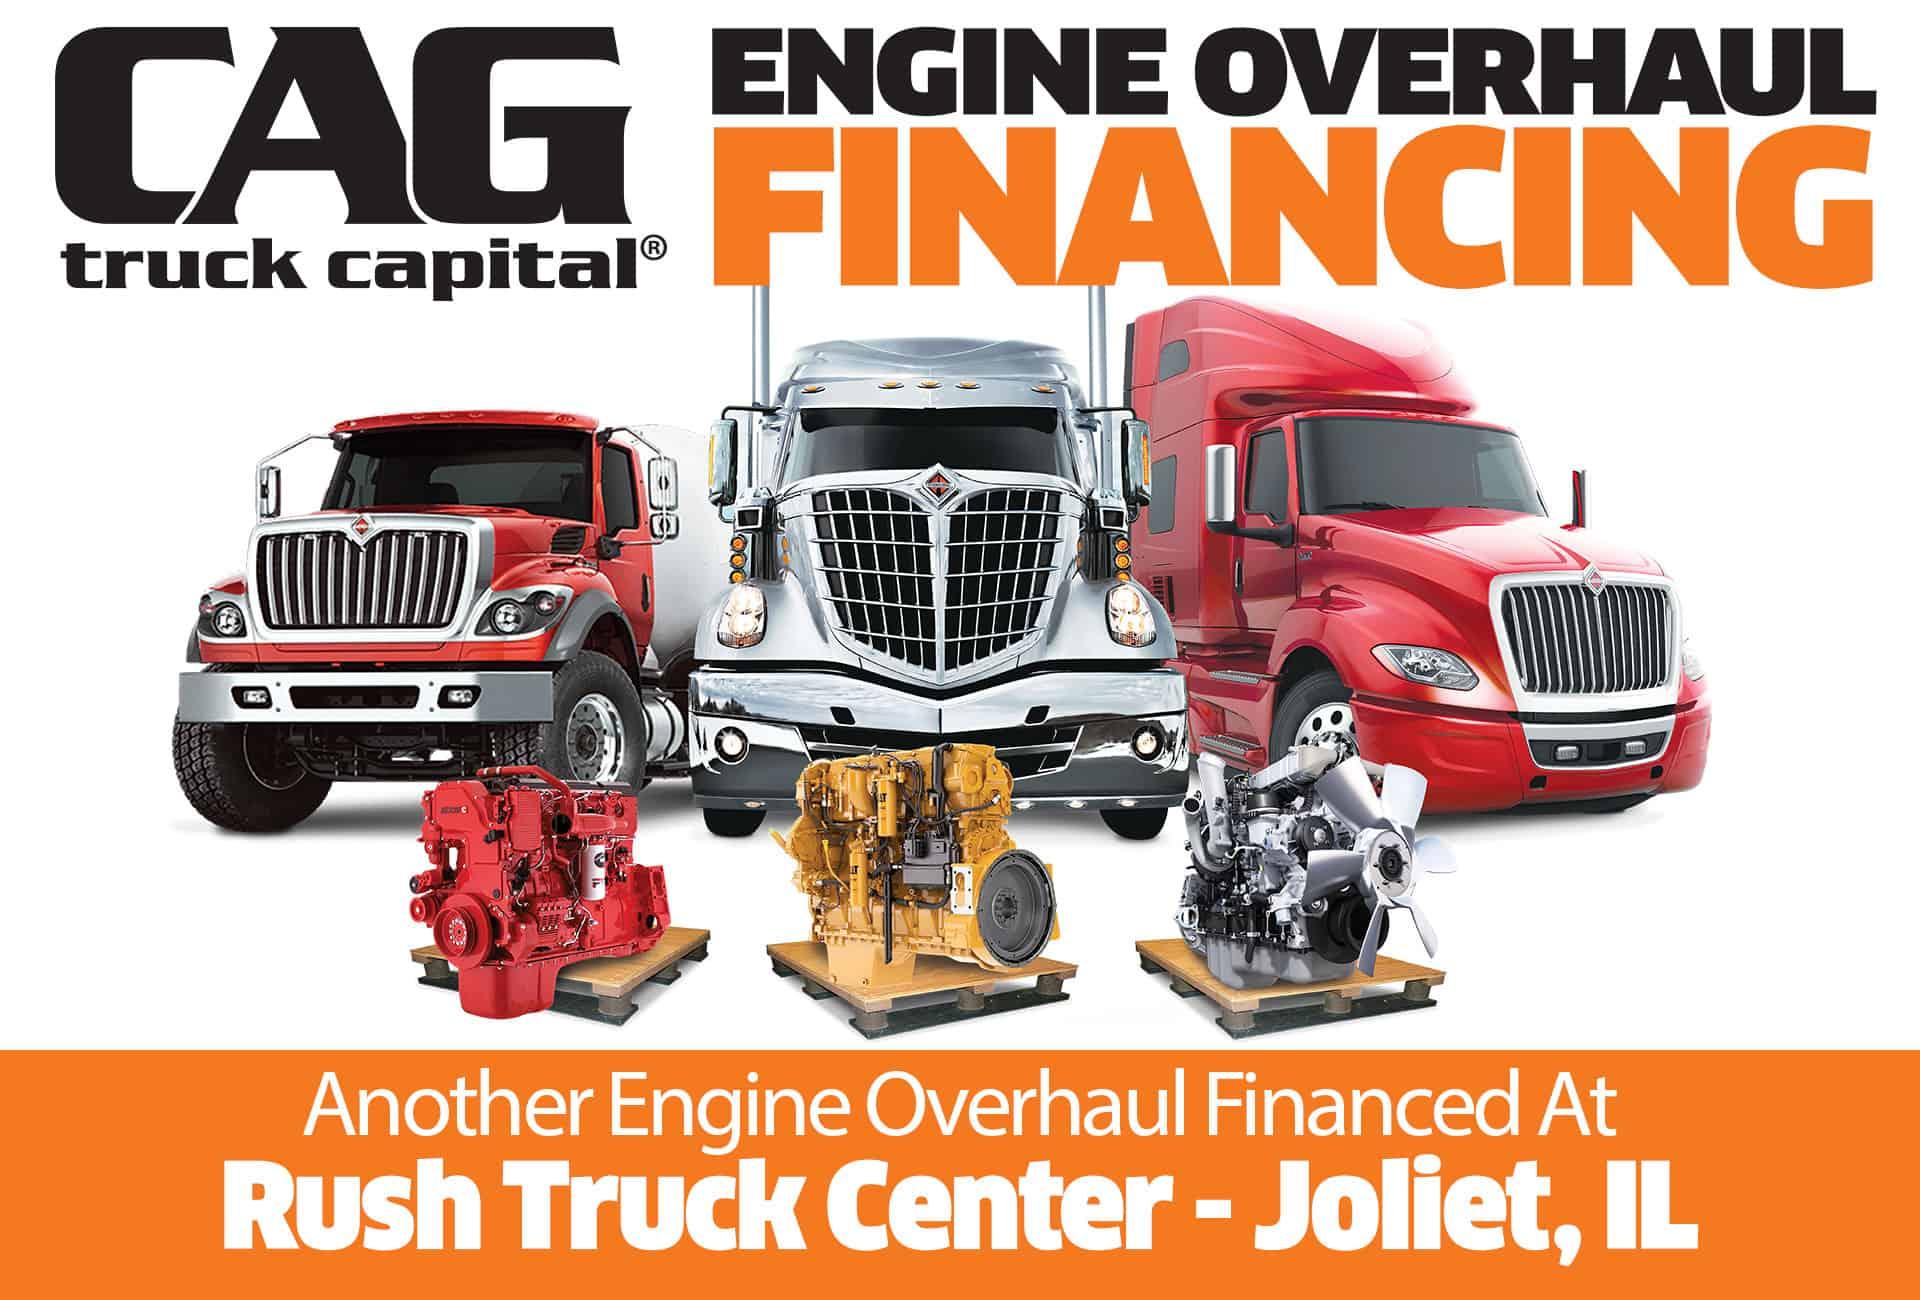 Rush Truck Center Joliet IL